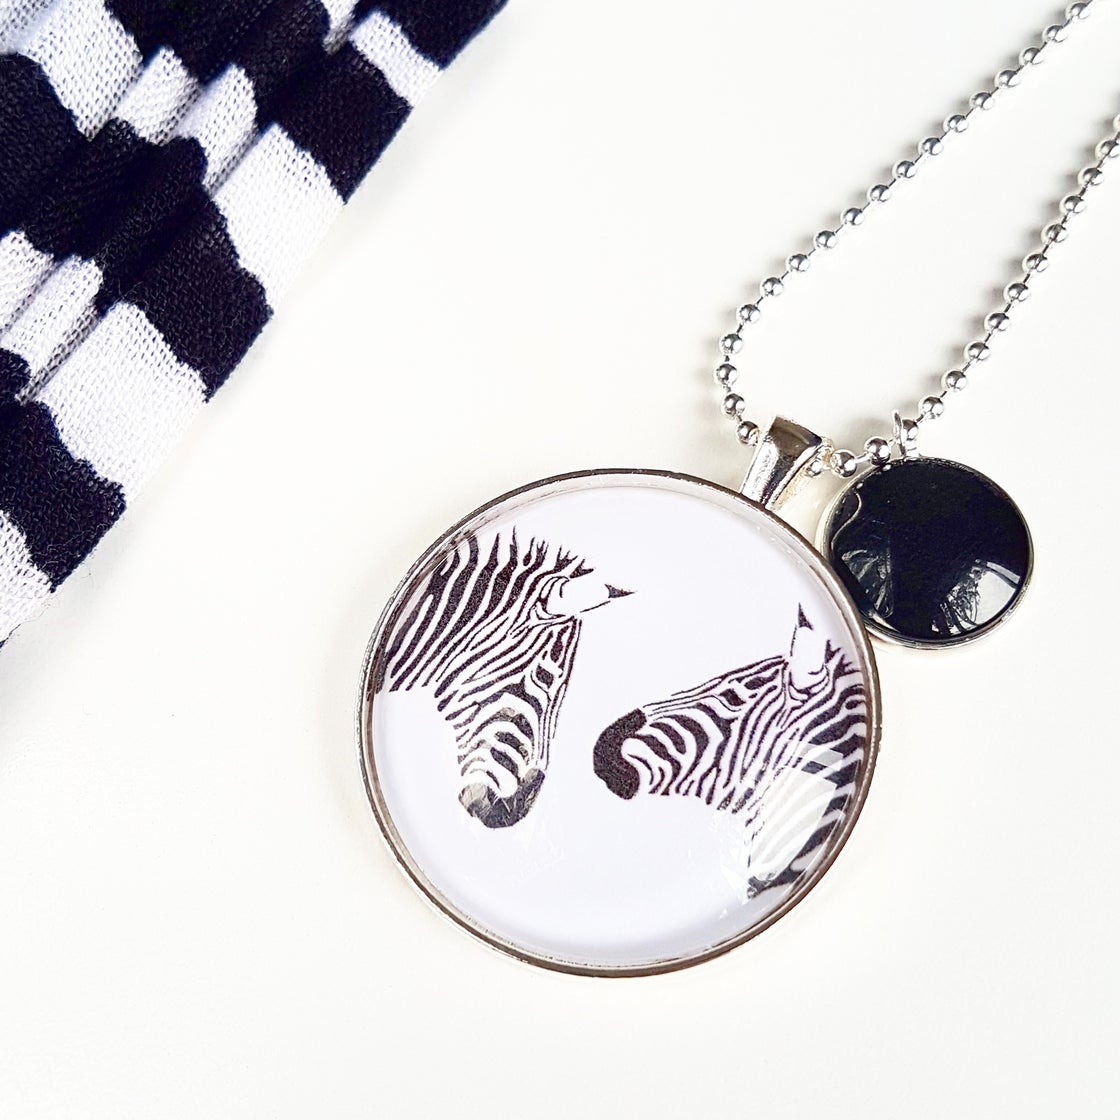 Image of 1.5inch pendant - Stripey Secrets